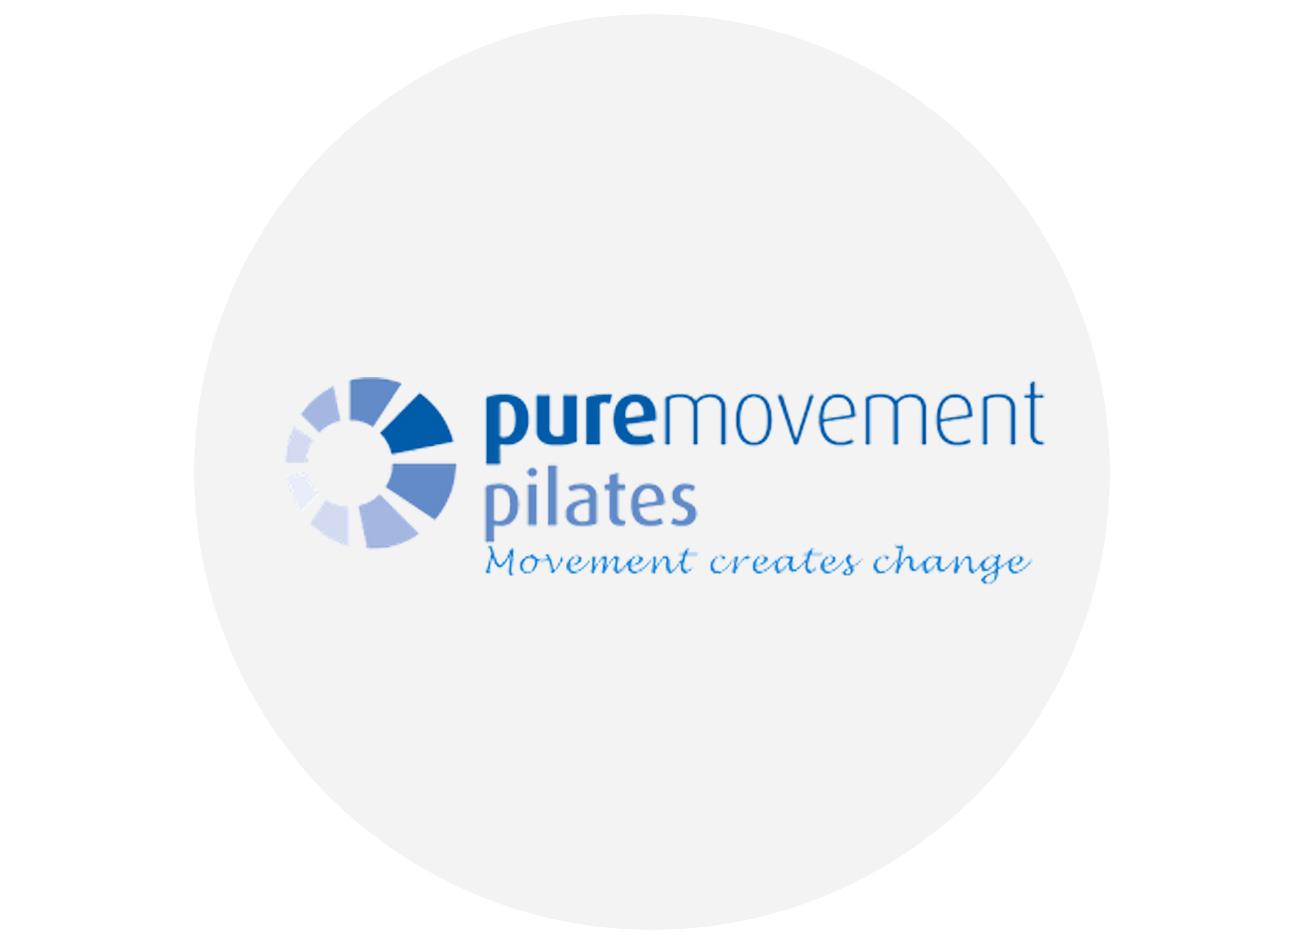 Pure-movement.jpg